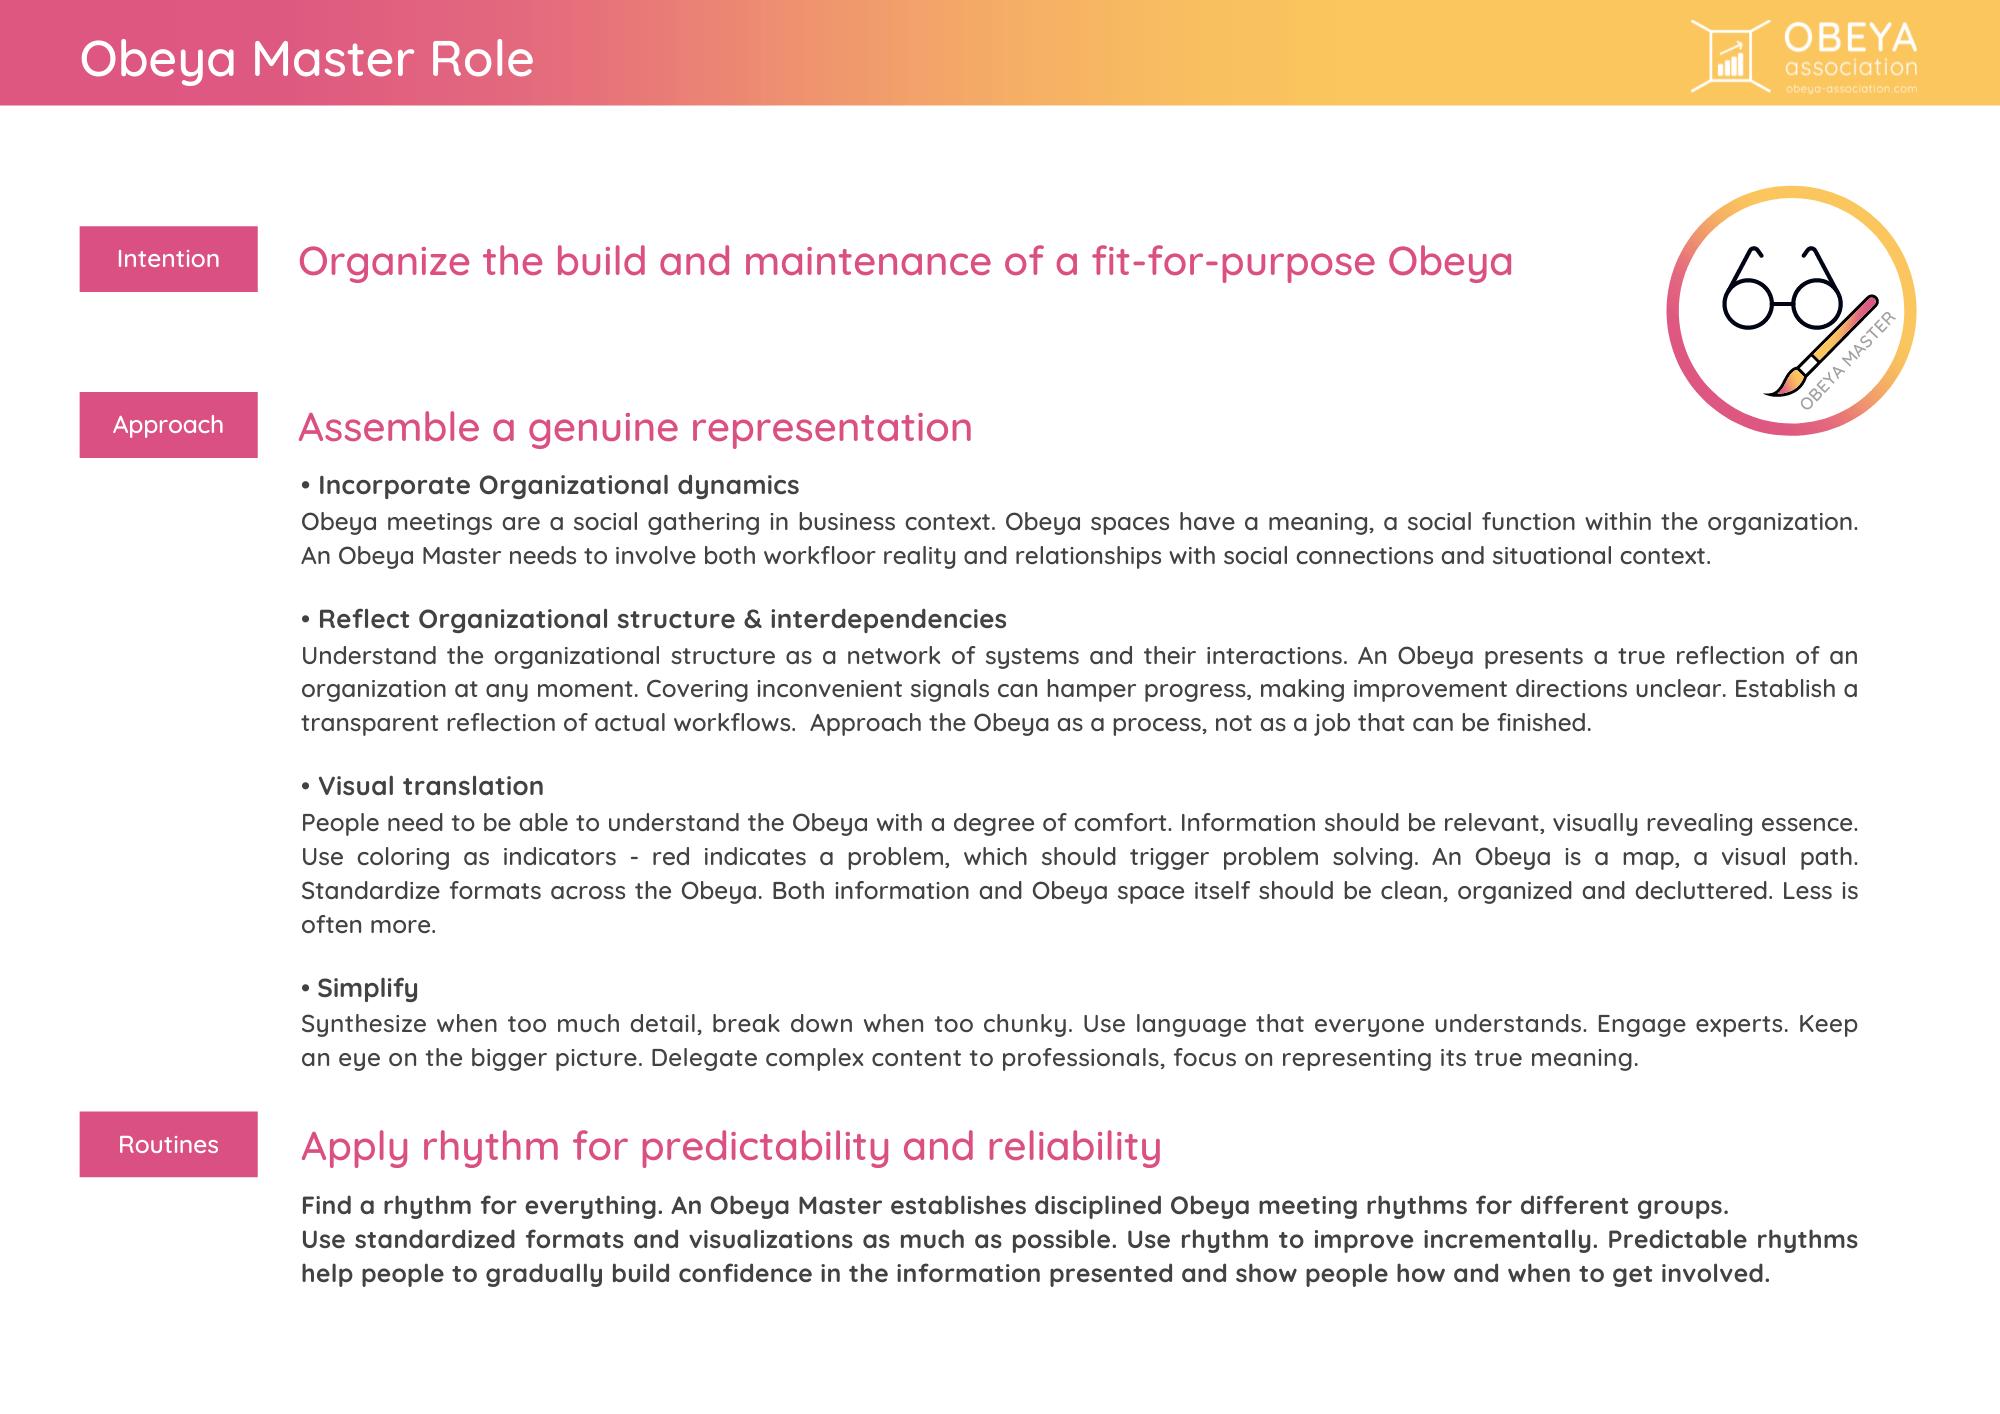 Obeya Master Role - Obeya Association